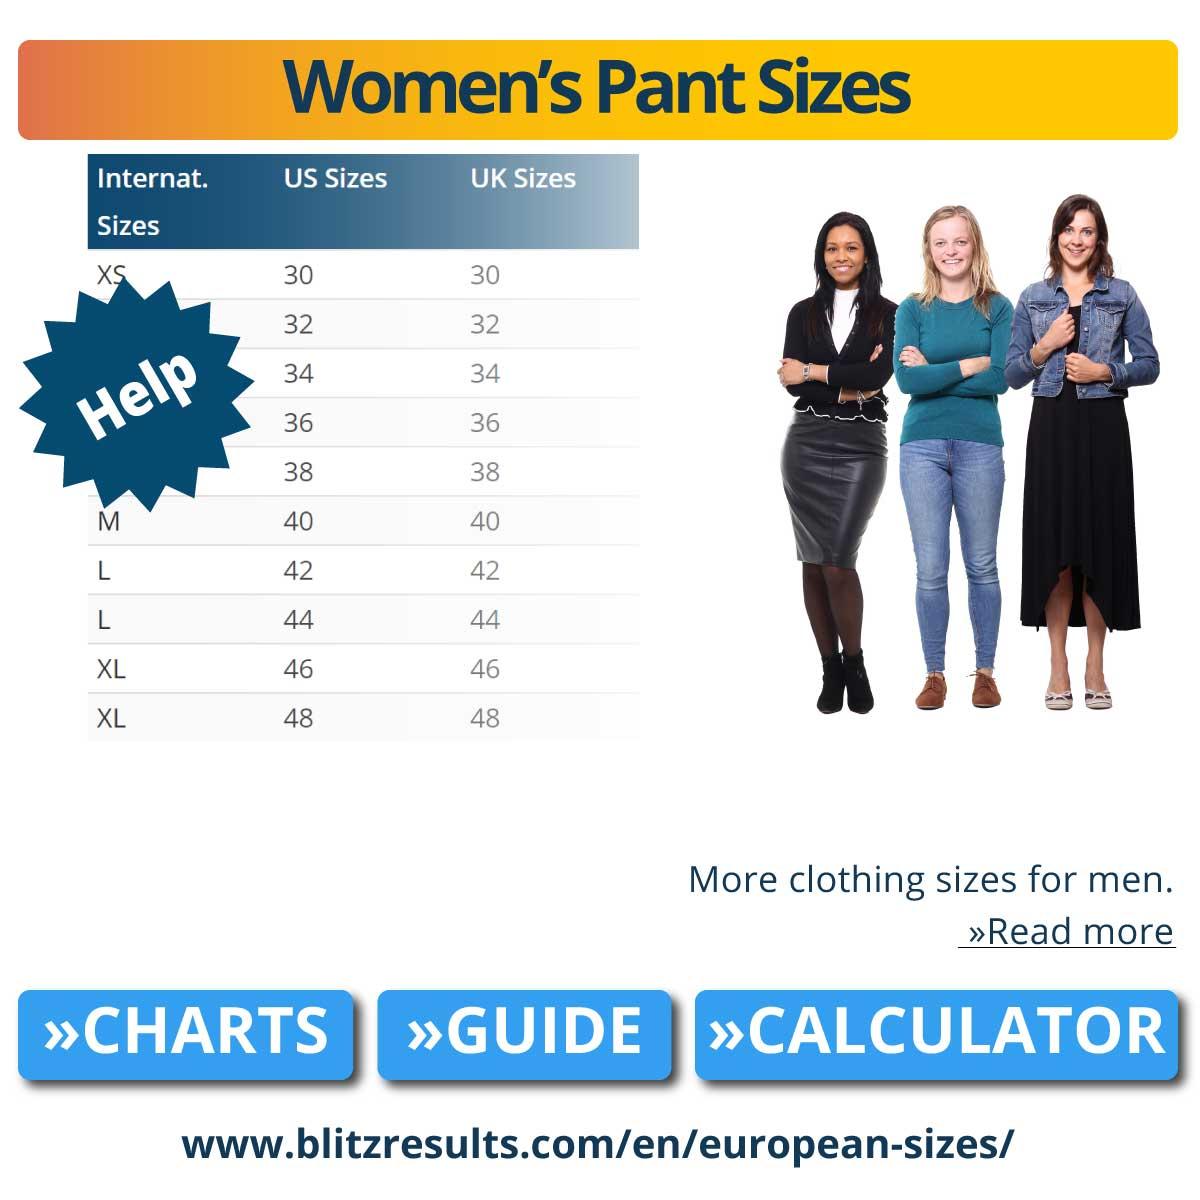 Women's Pant Sizes